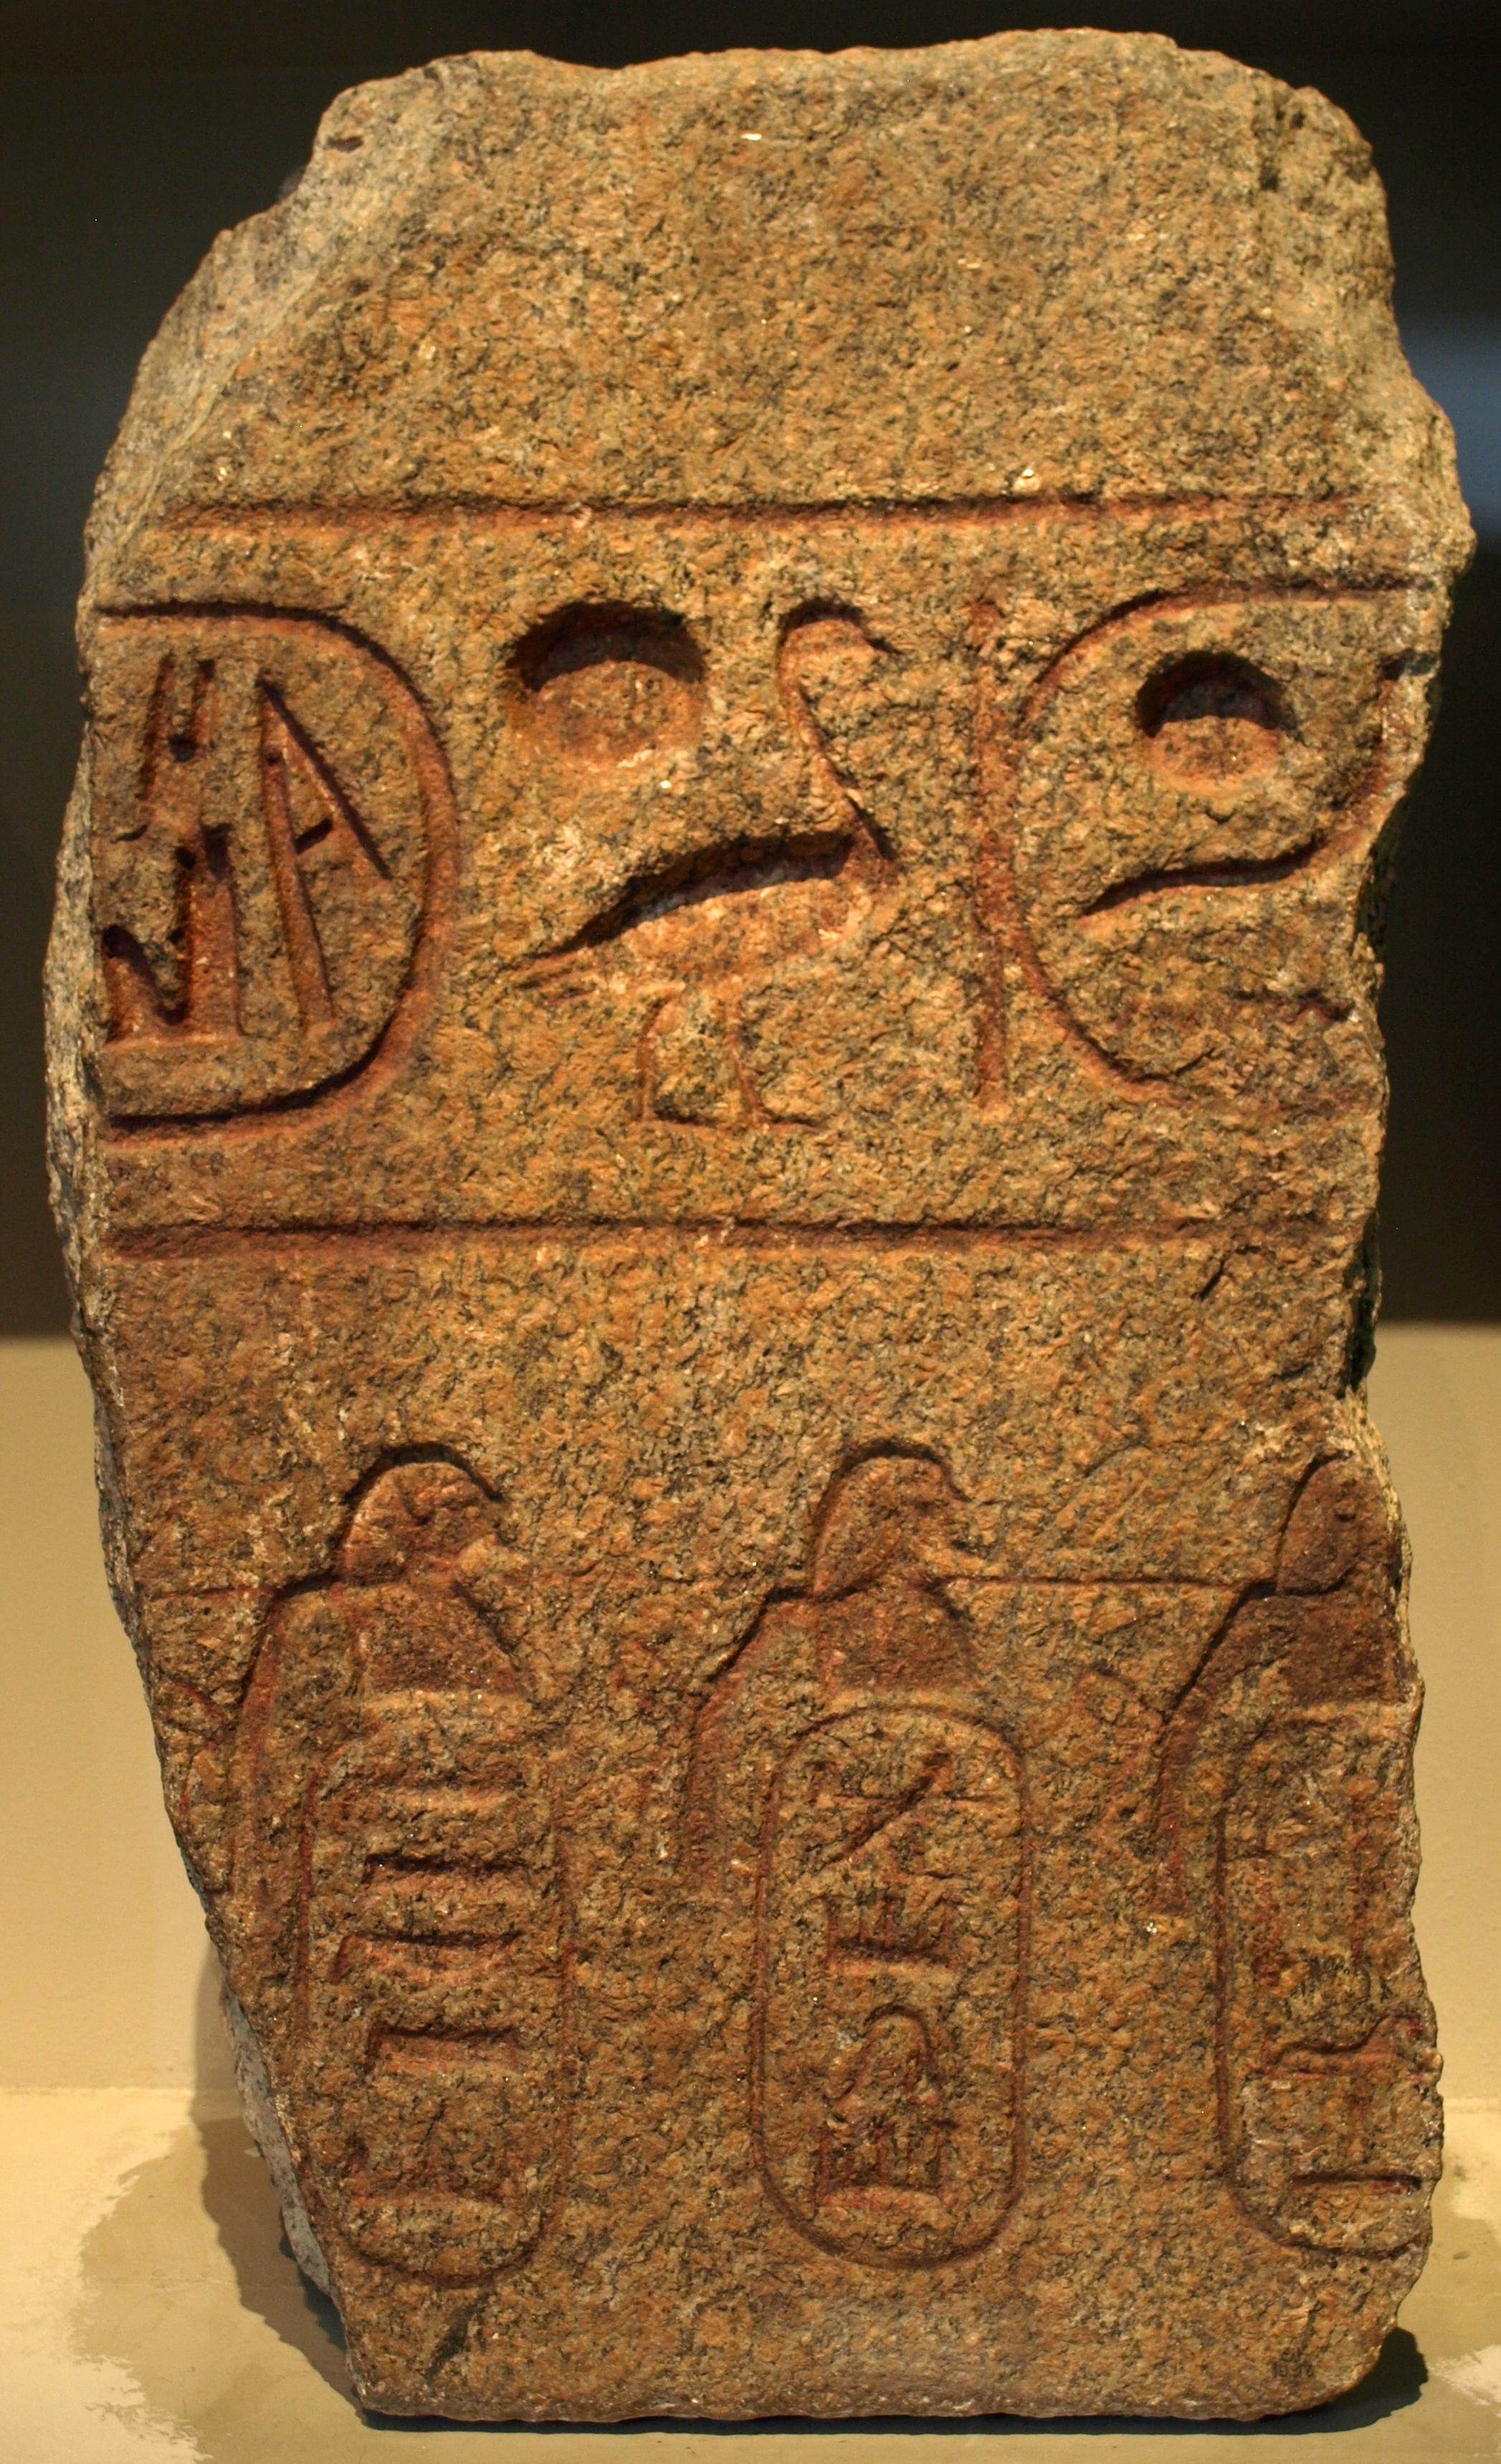 graniteblockshowingcapturedforeigntowns-britishmuseum-august19-08.jpg